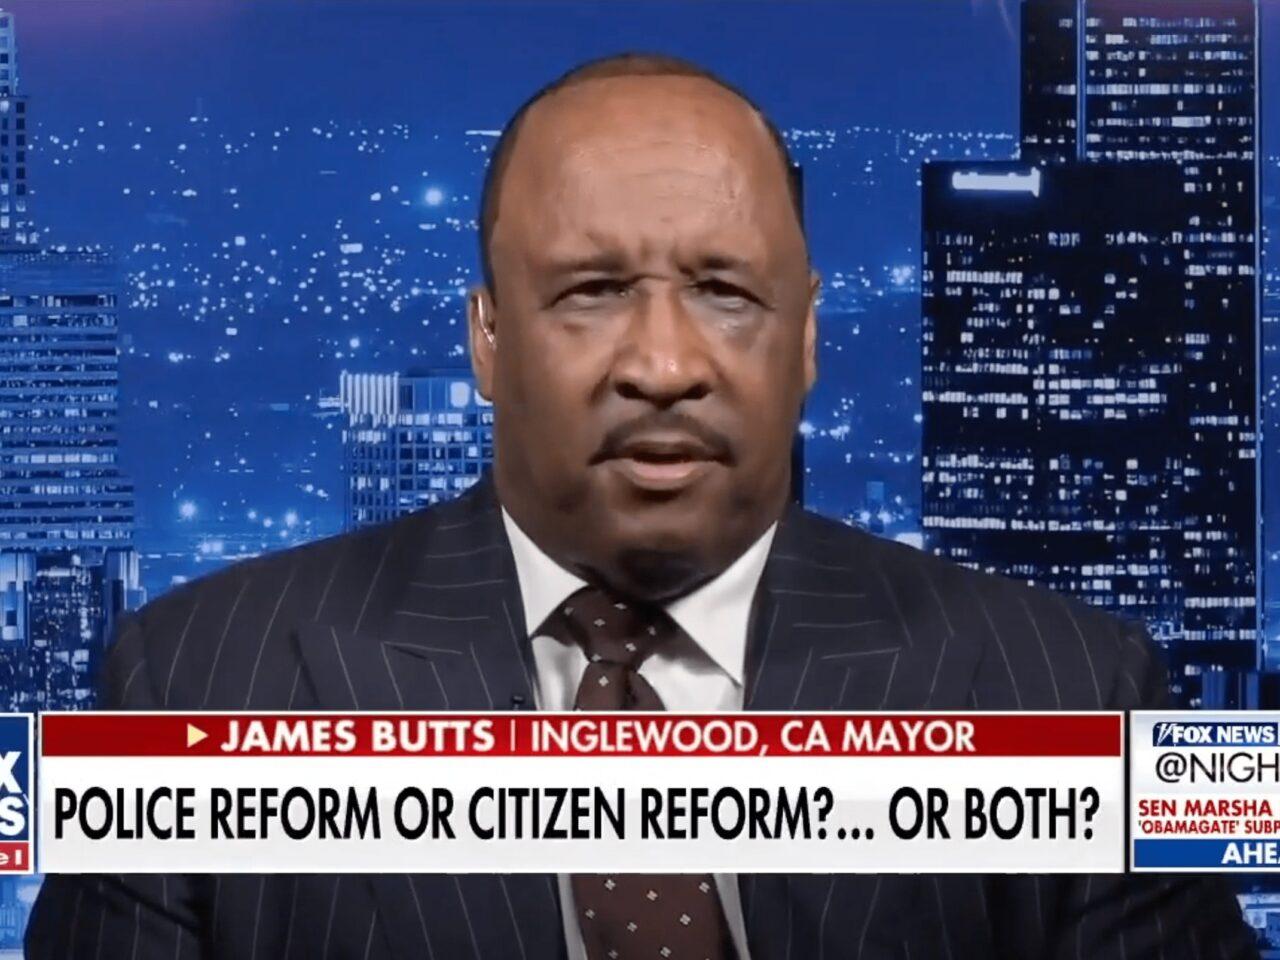 https://jamestbutts.com/wp-content/uploads/2020/08/MayorButts2-1280x960.jpg